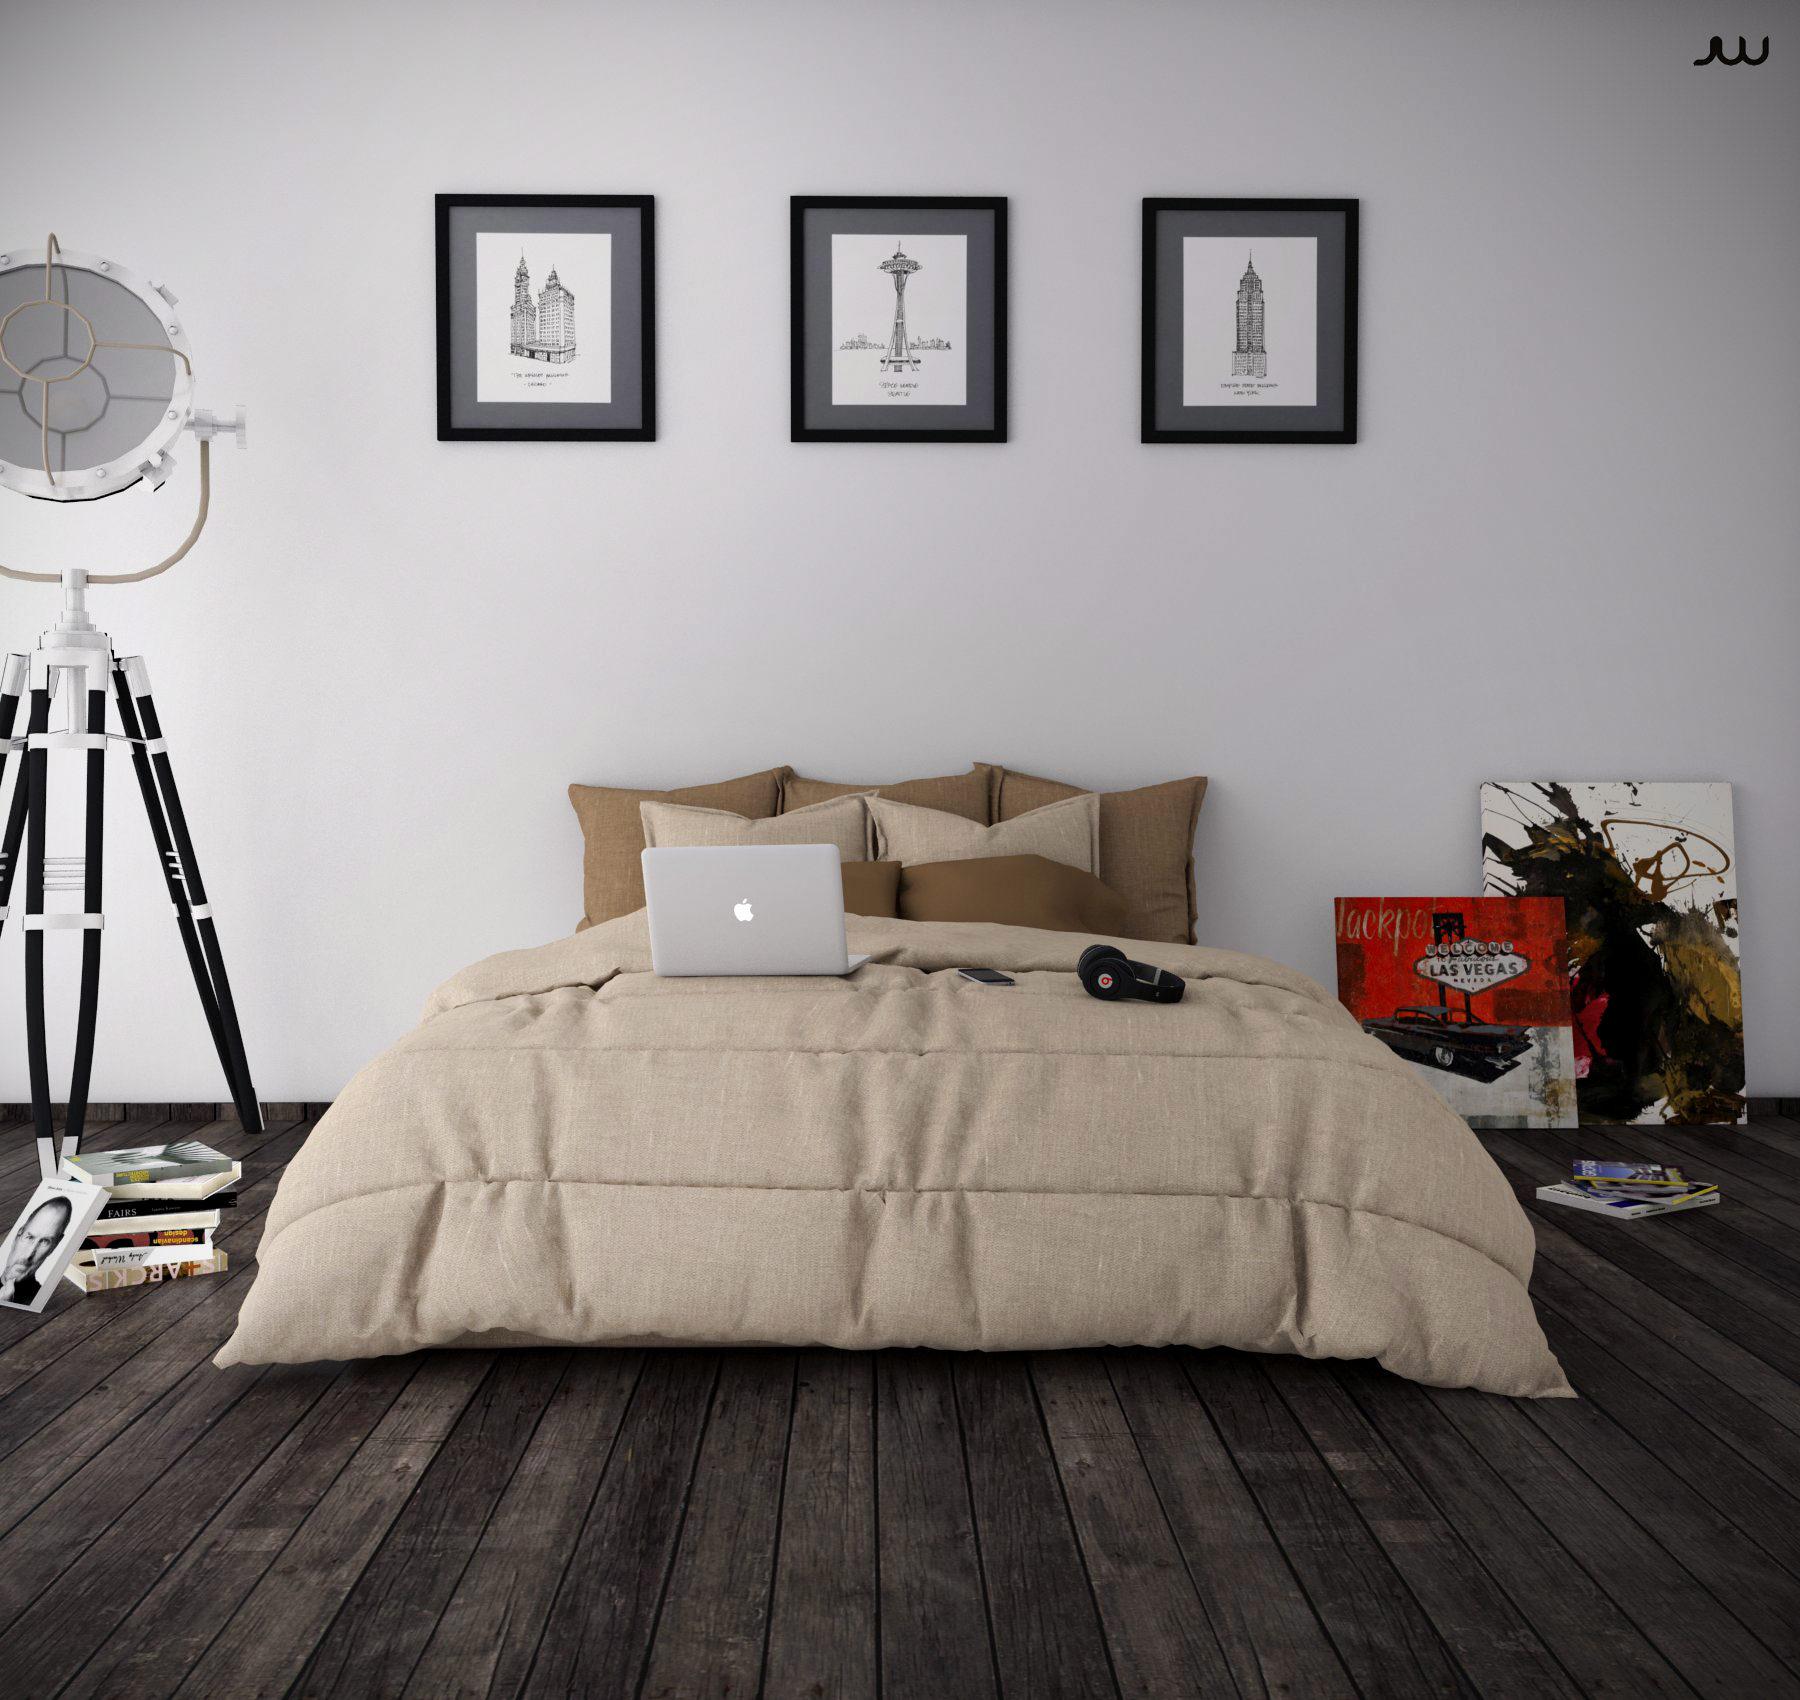 Model Bedroom bedroom minimalist free 3d model skp